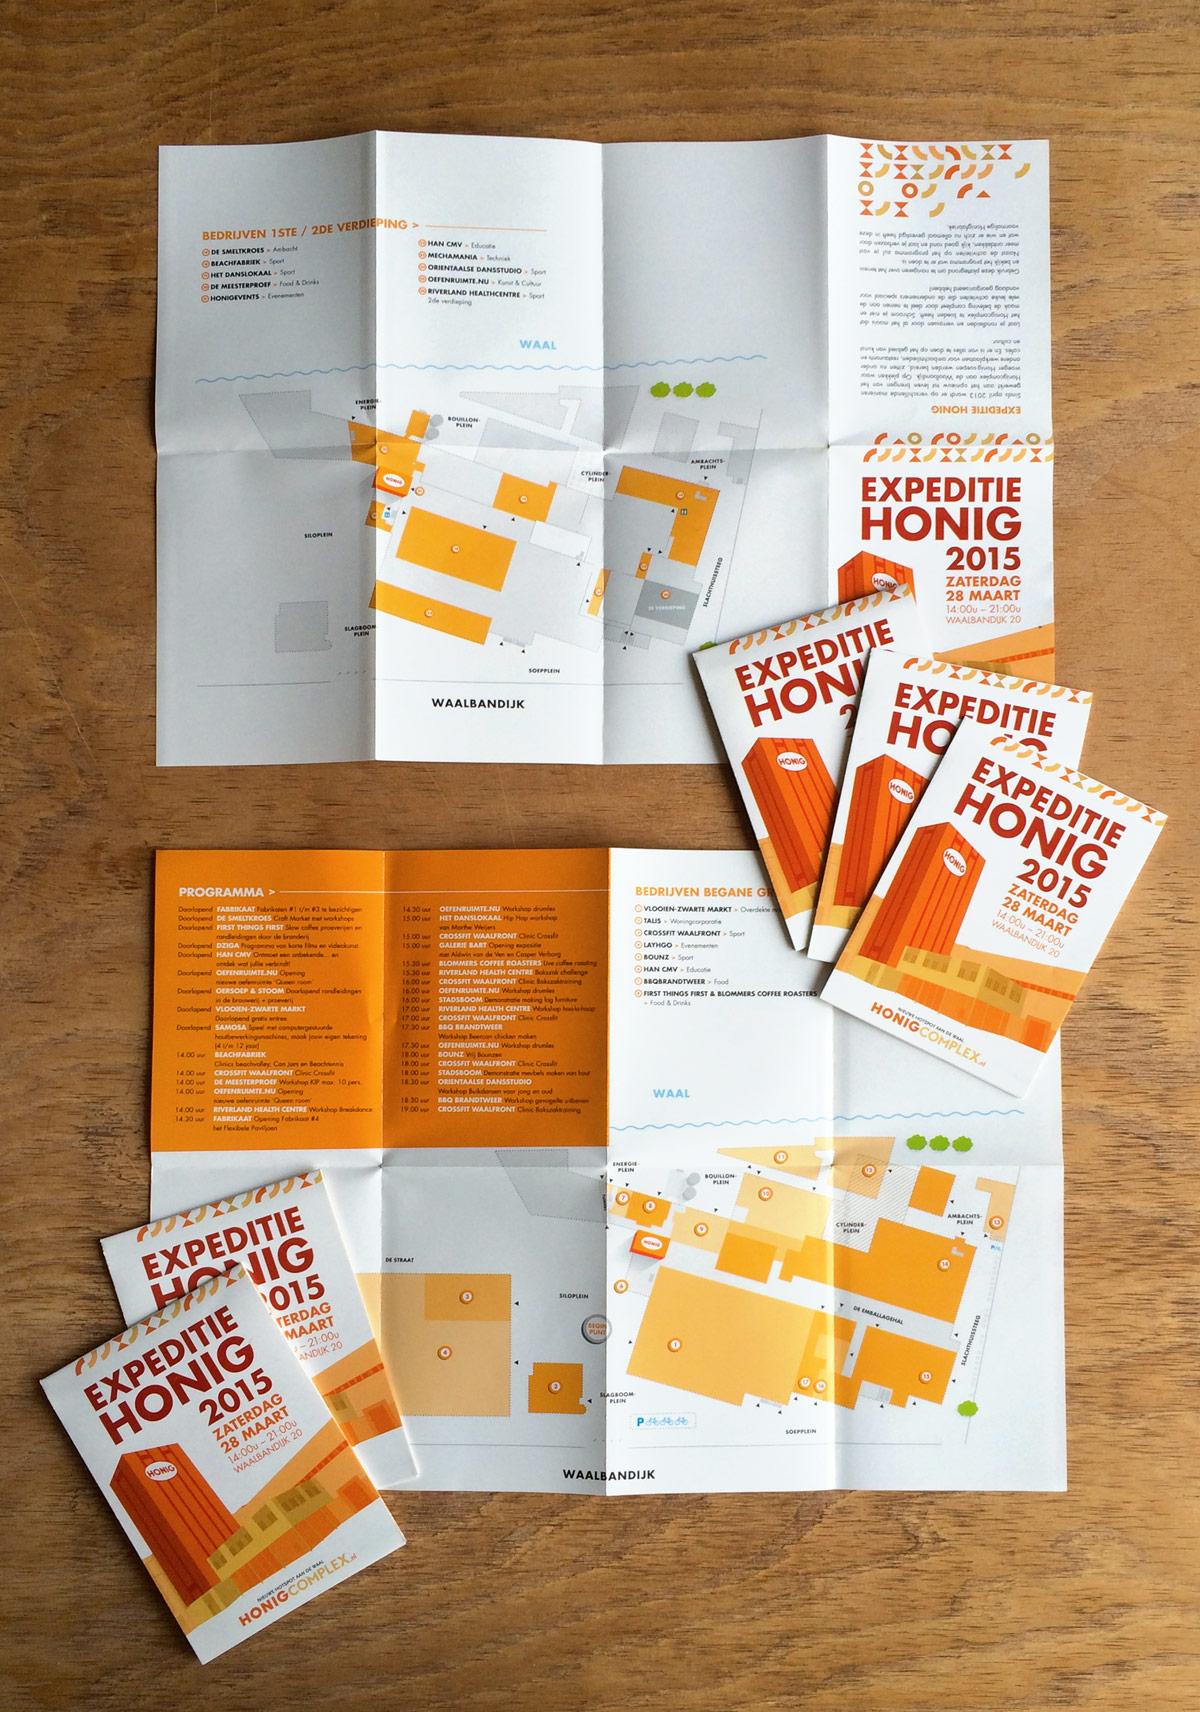 Expeditie_Honig_ReVisie_folder